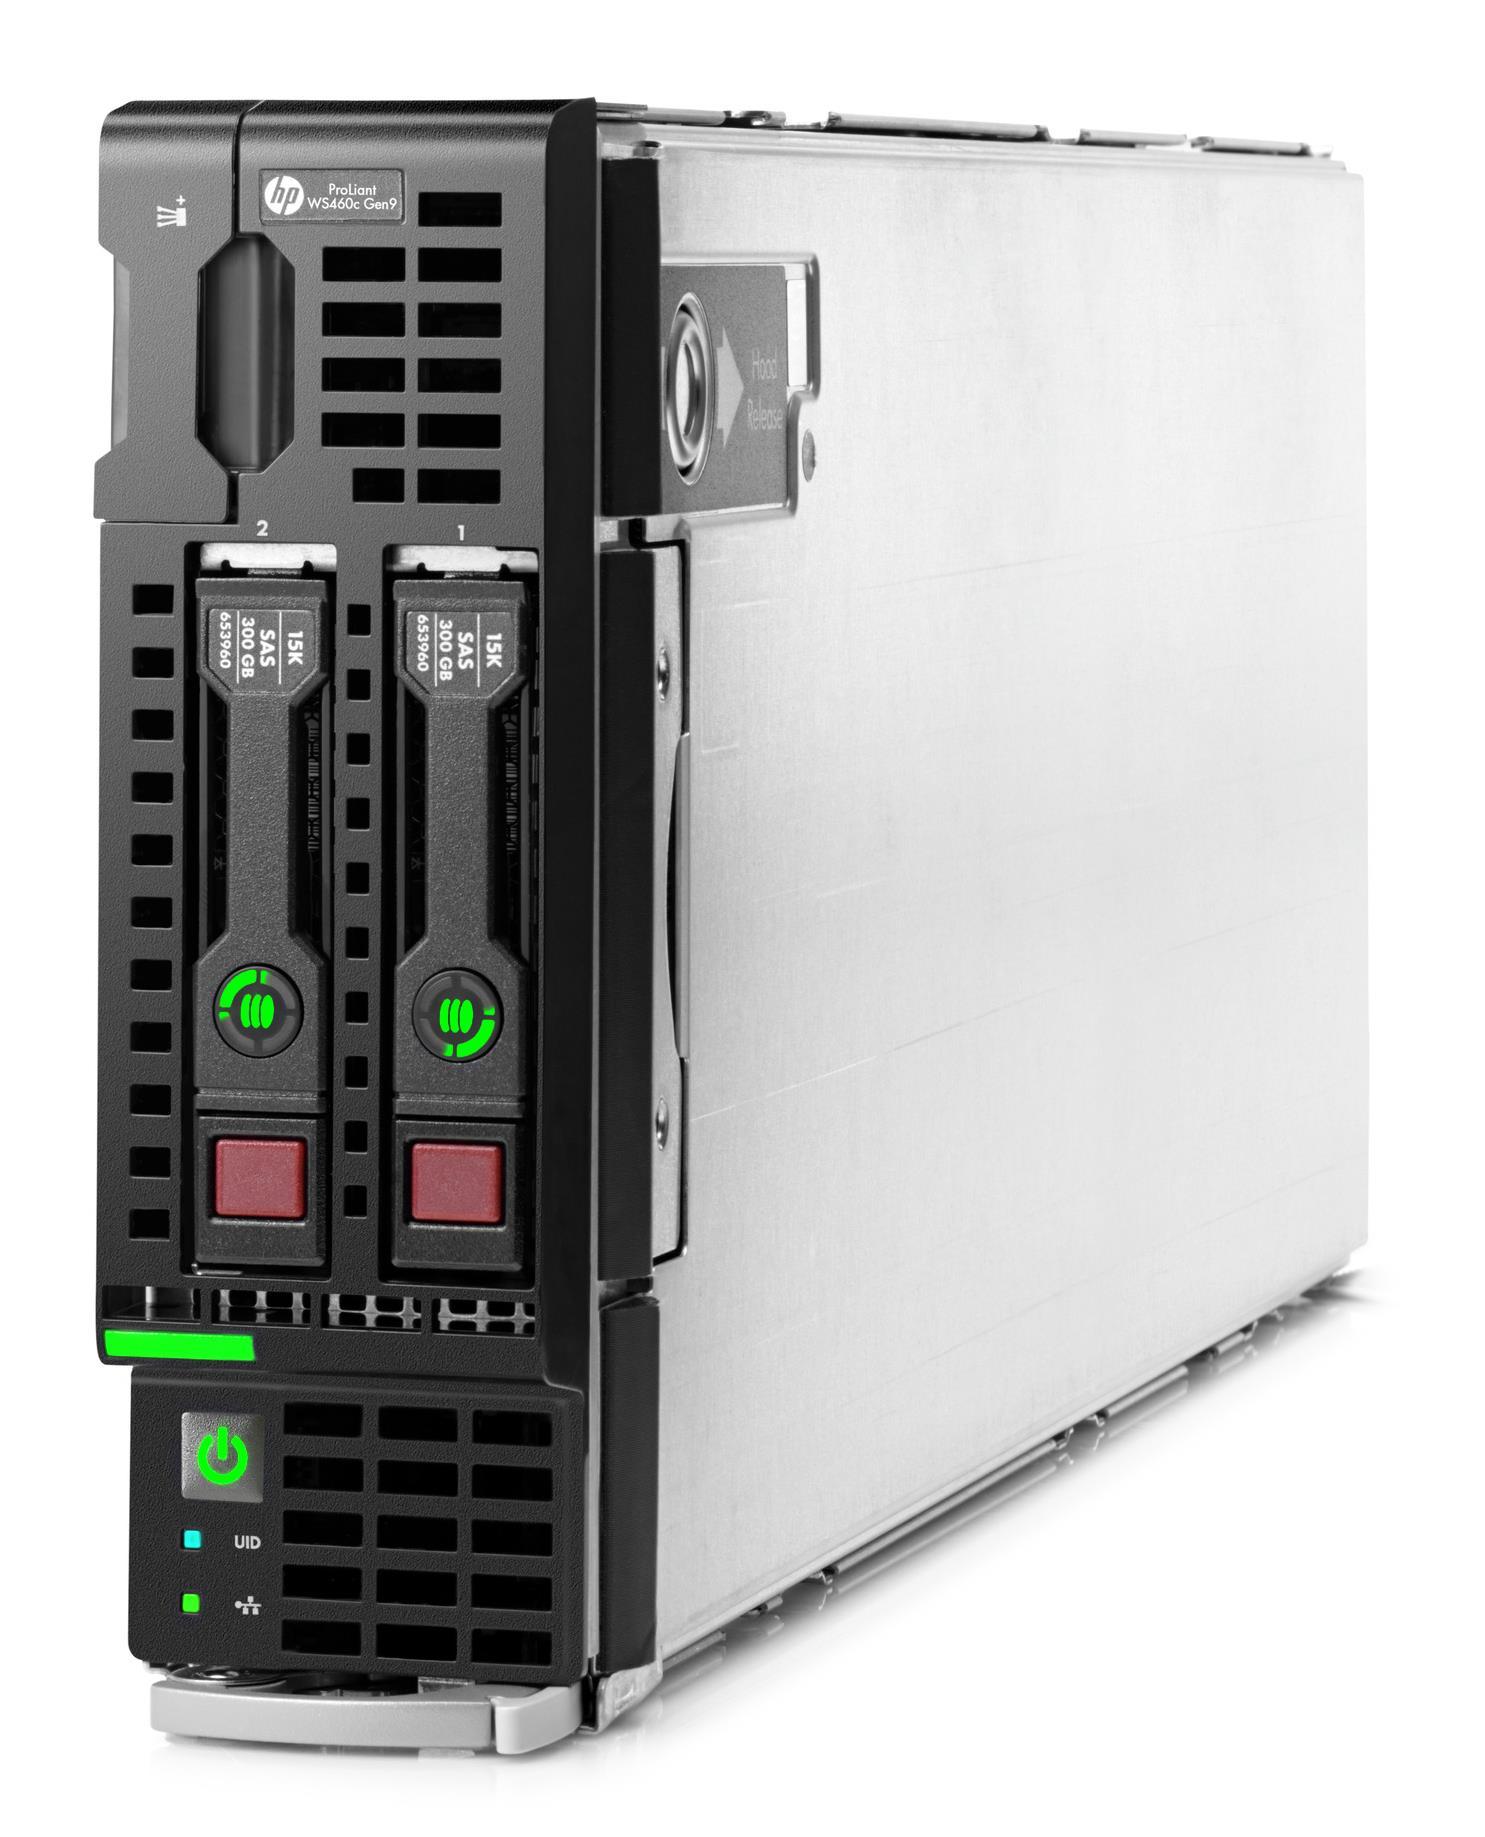 HP ProLiant WS460c Gen9 E5-v3 Configure-to-order Graphics Server Blade